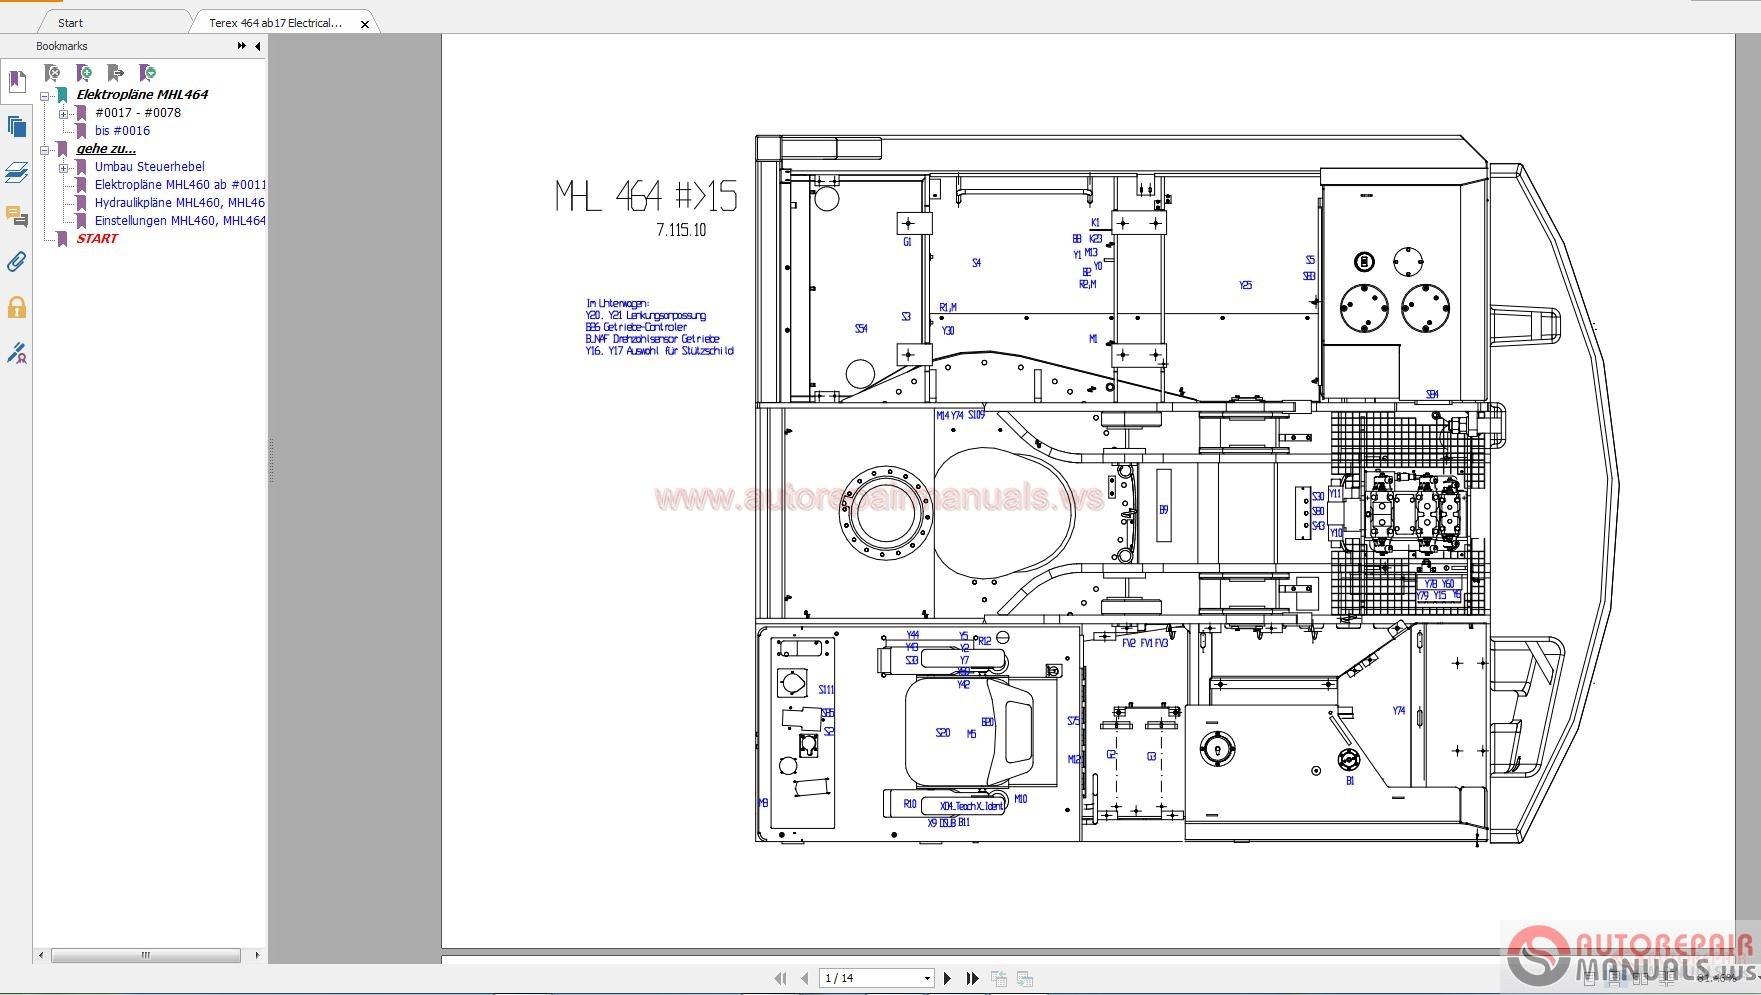 Genie Z45 22 Parts Manual Lift Wiring Diagram